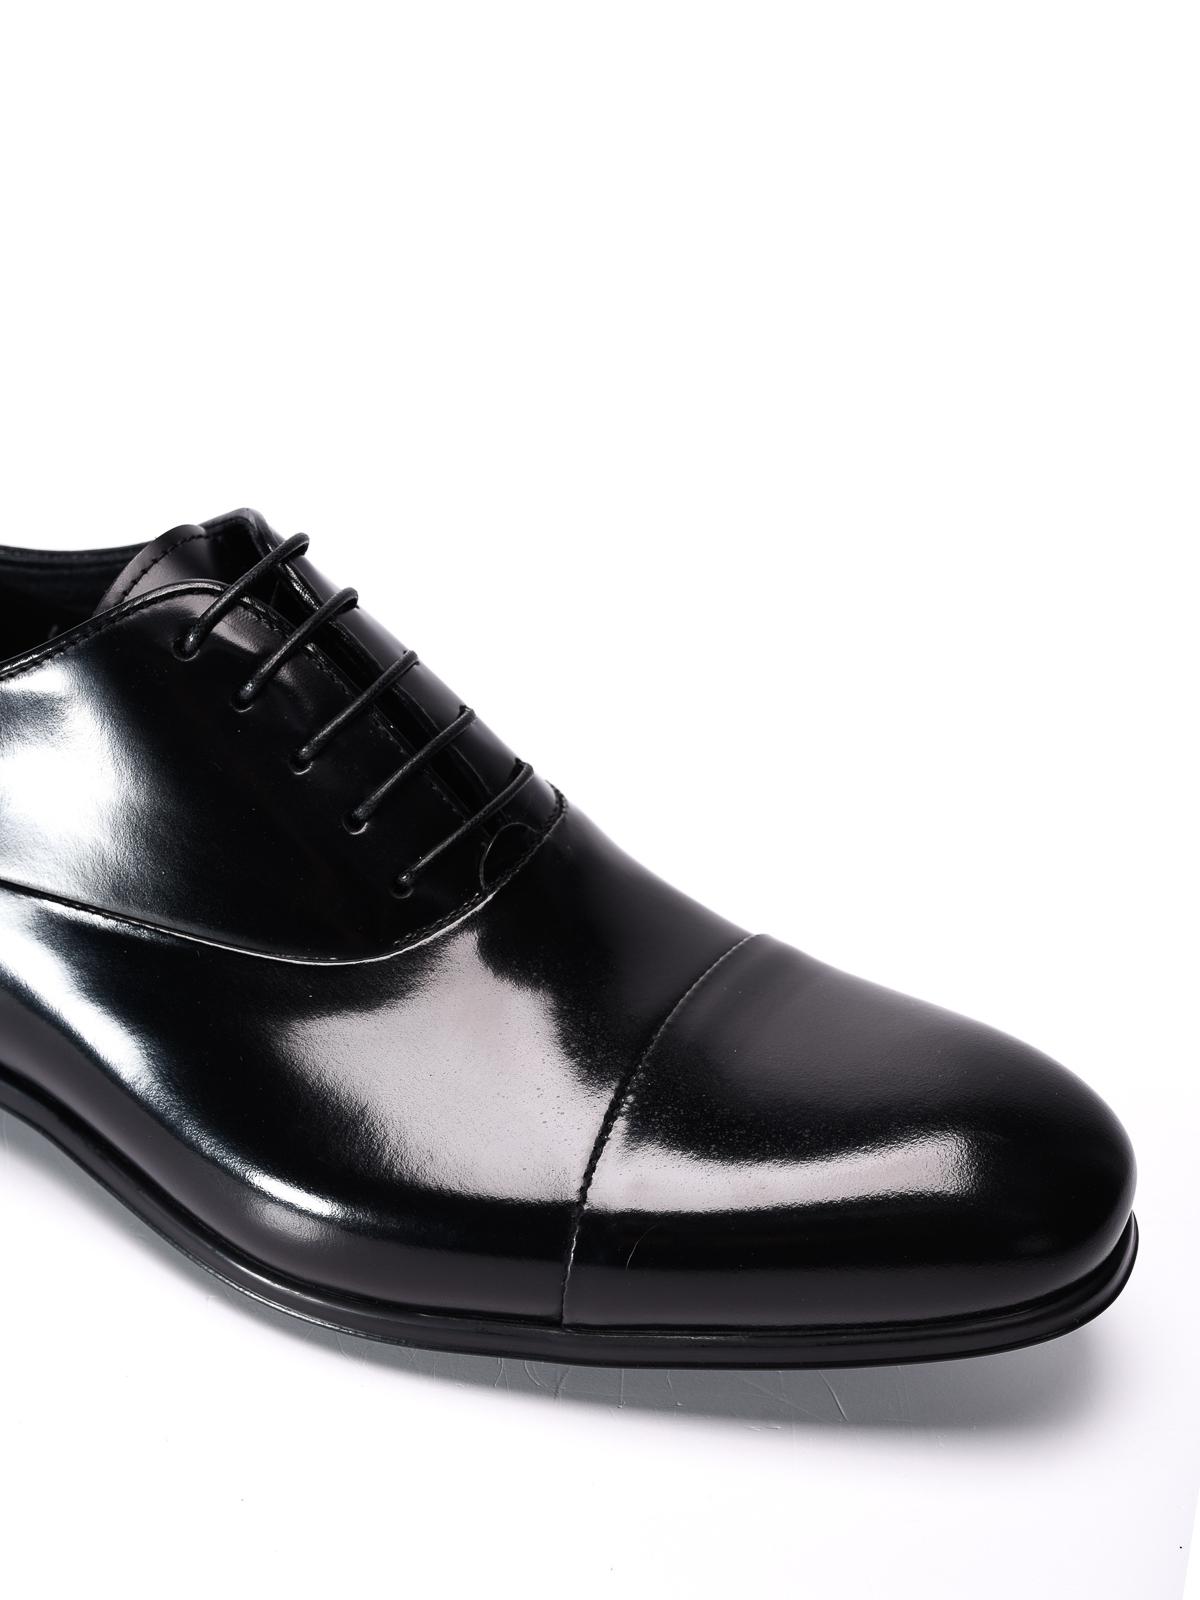 e718751ba8a687 Homme · Vêtements · Sacs · Chaussures · Achetez maintenant · iKRIX Doucal